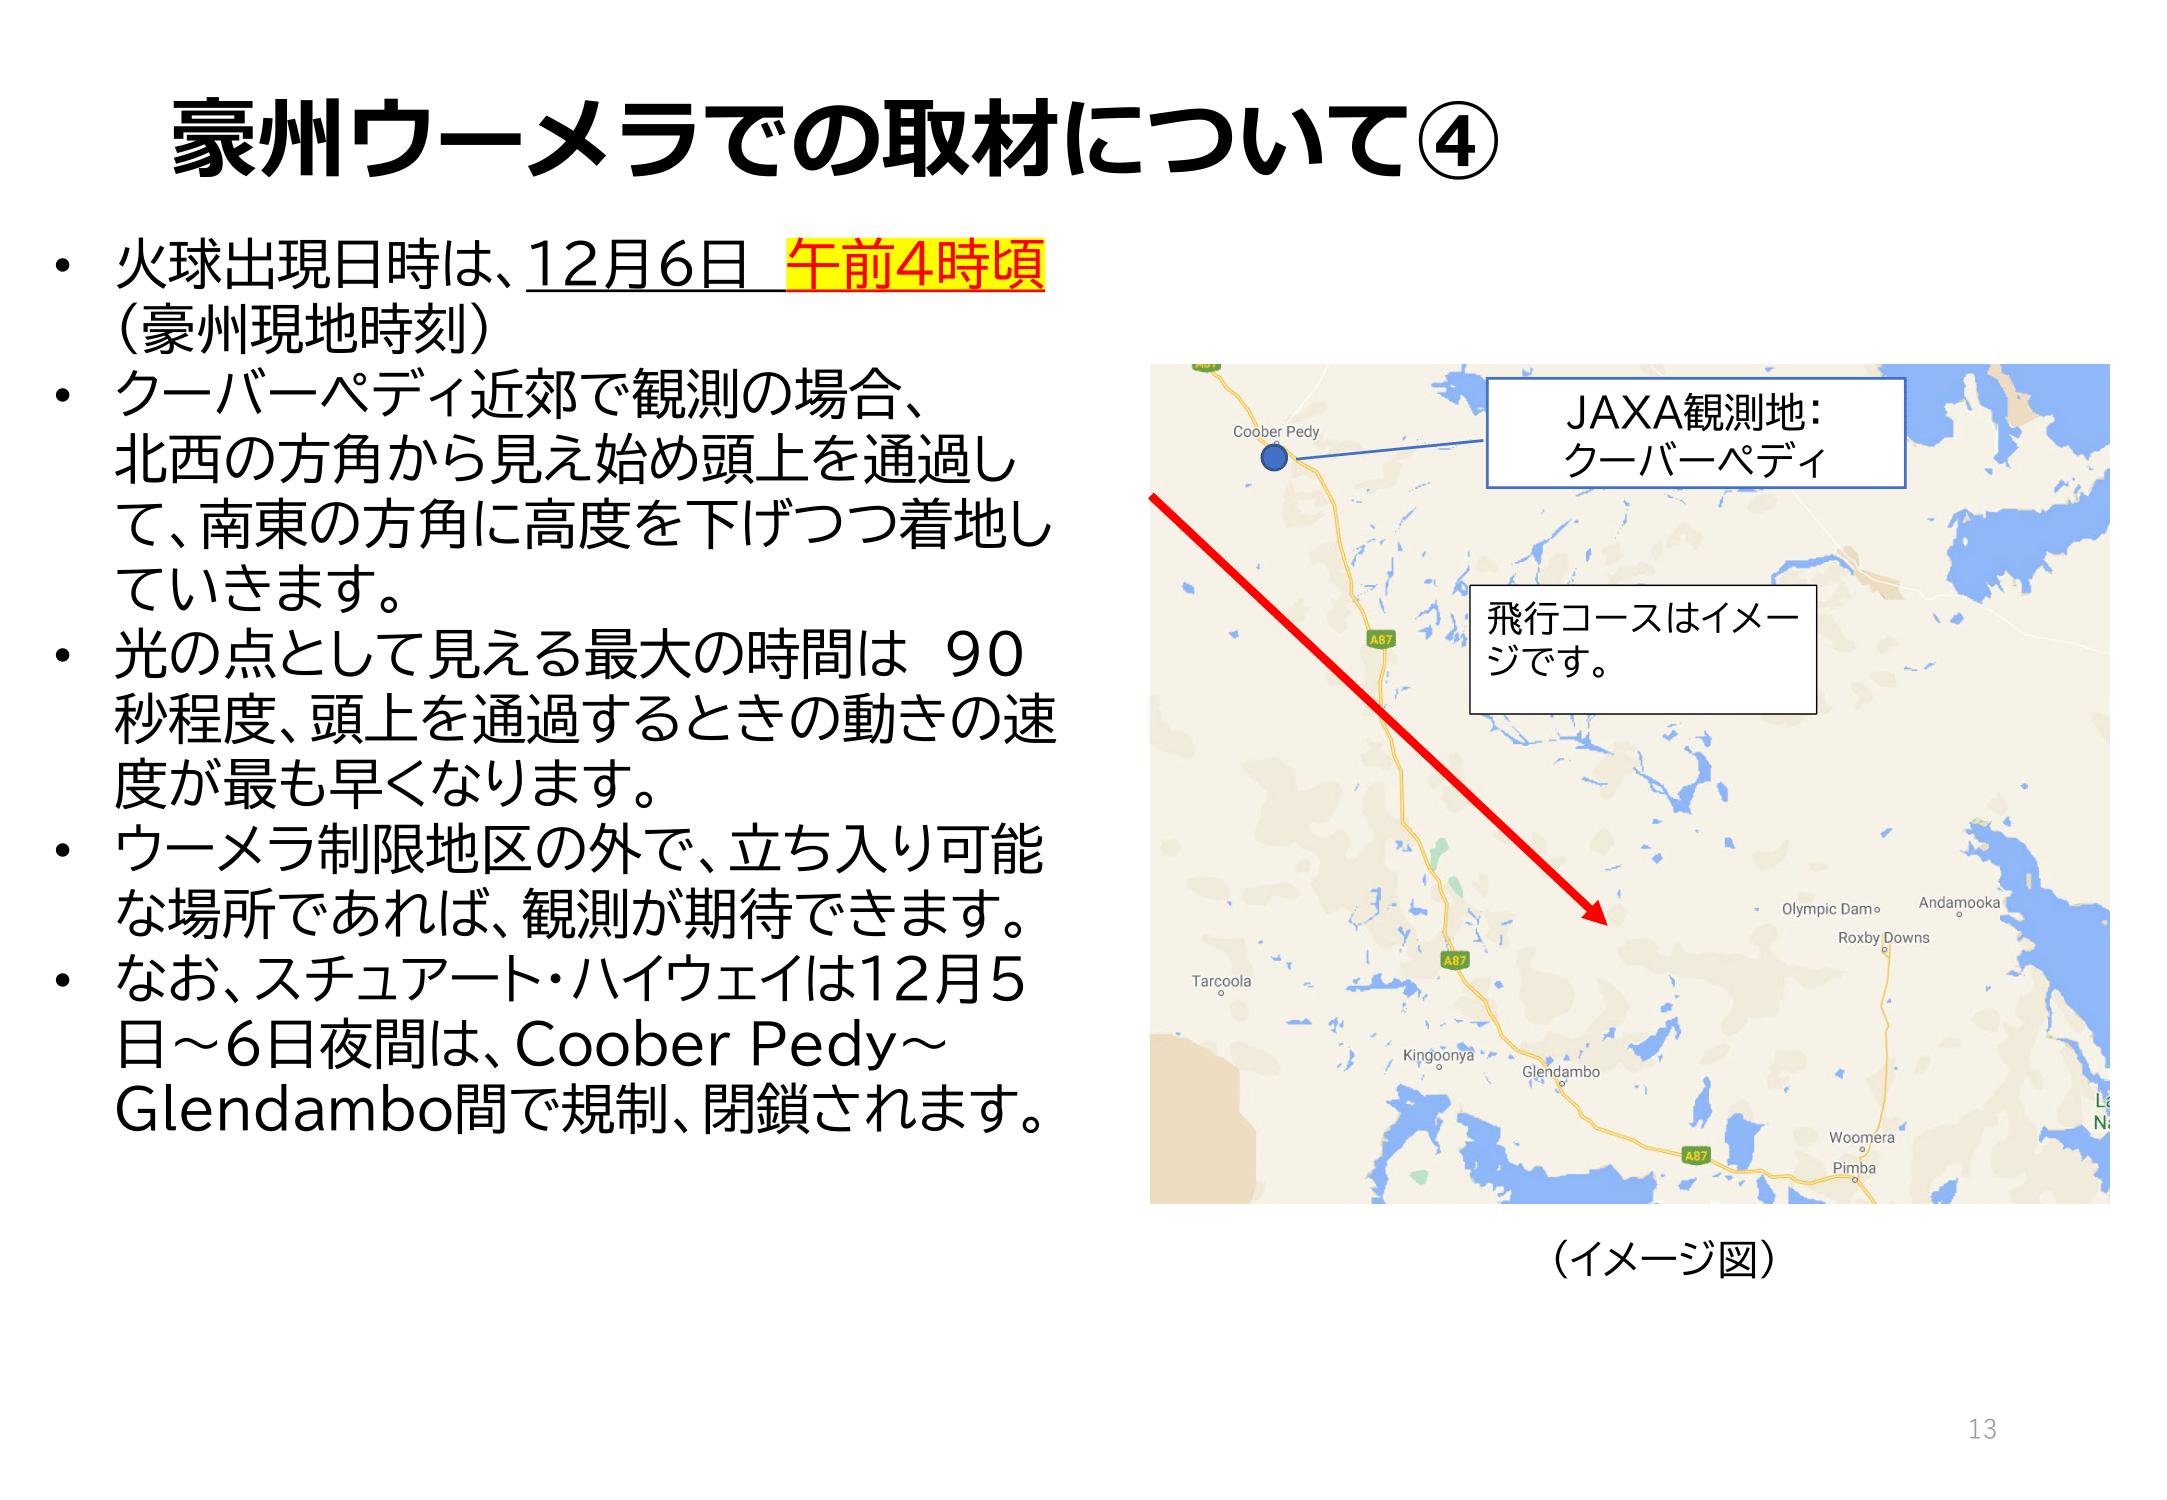 f:id:Imamura:20201130154439p:plain:h250